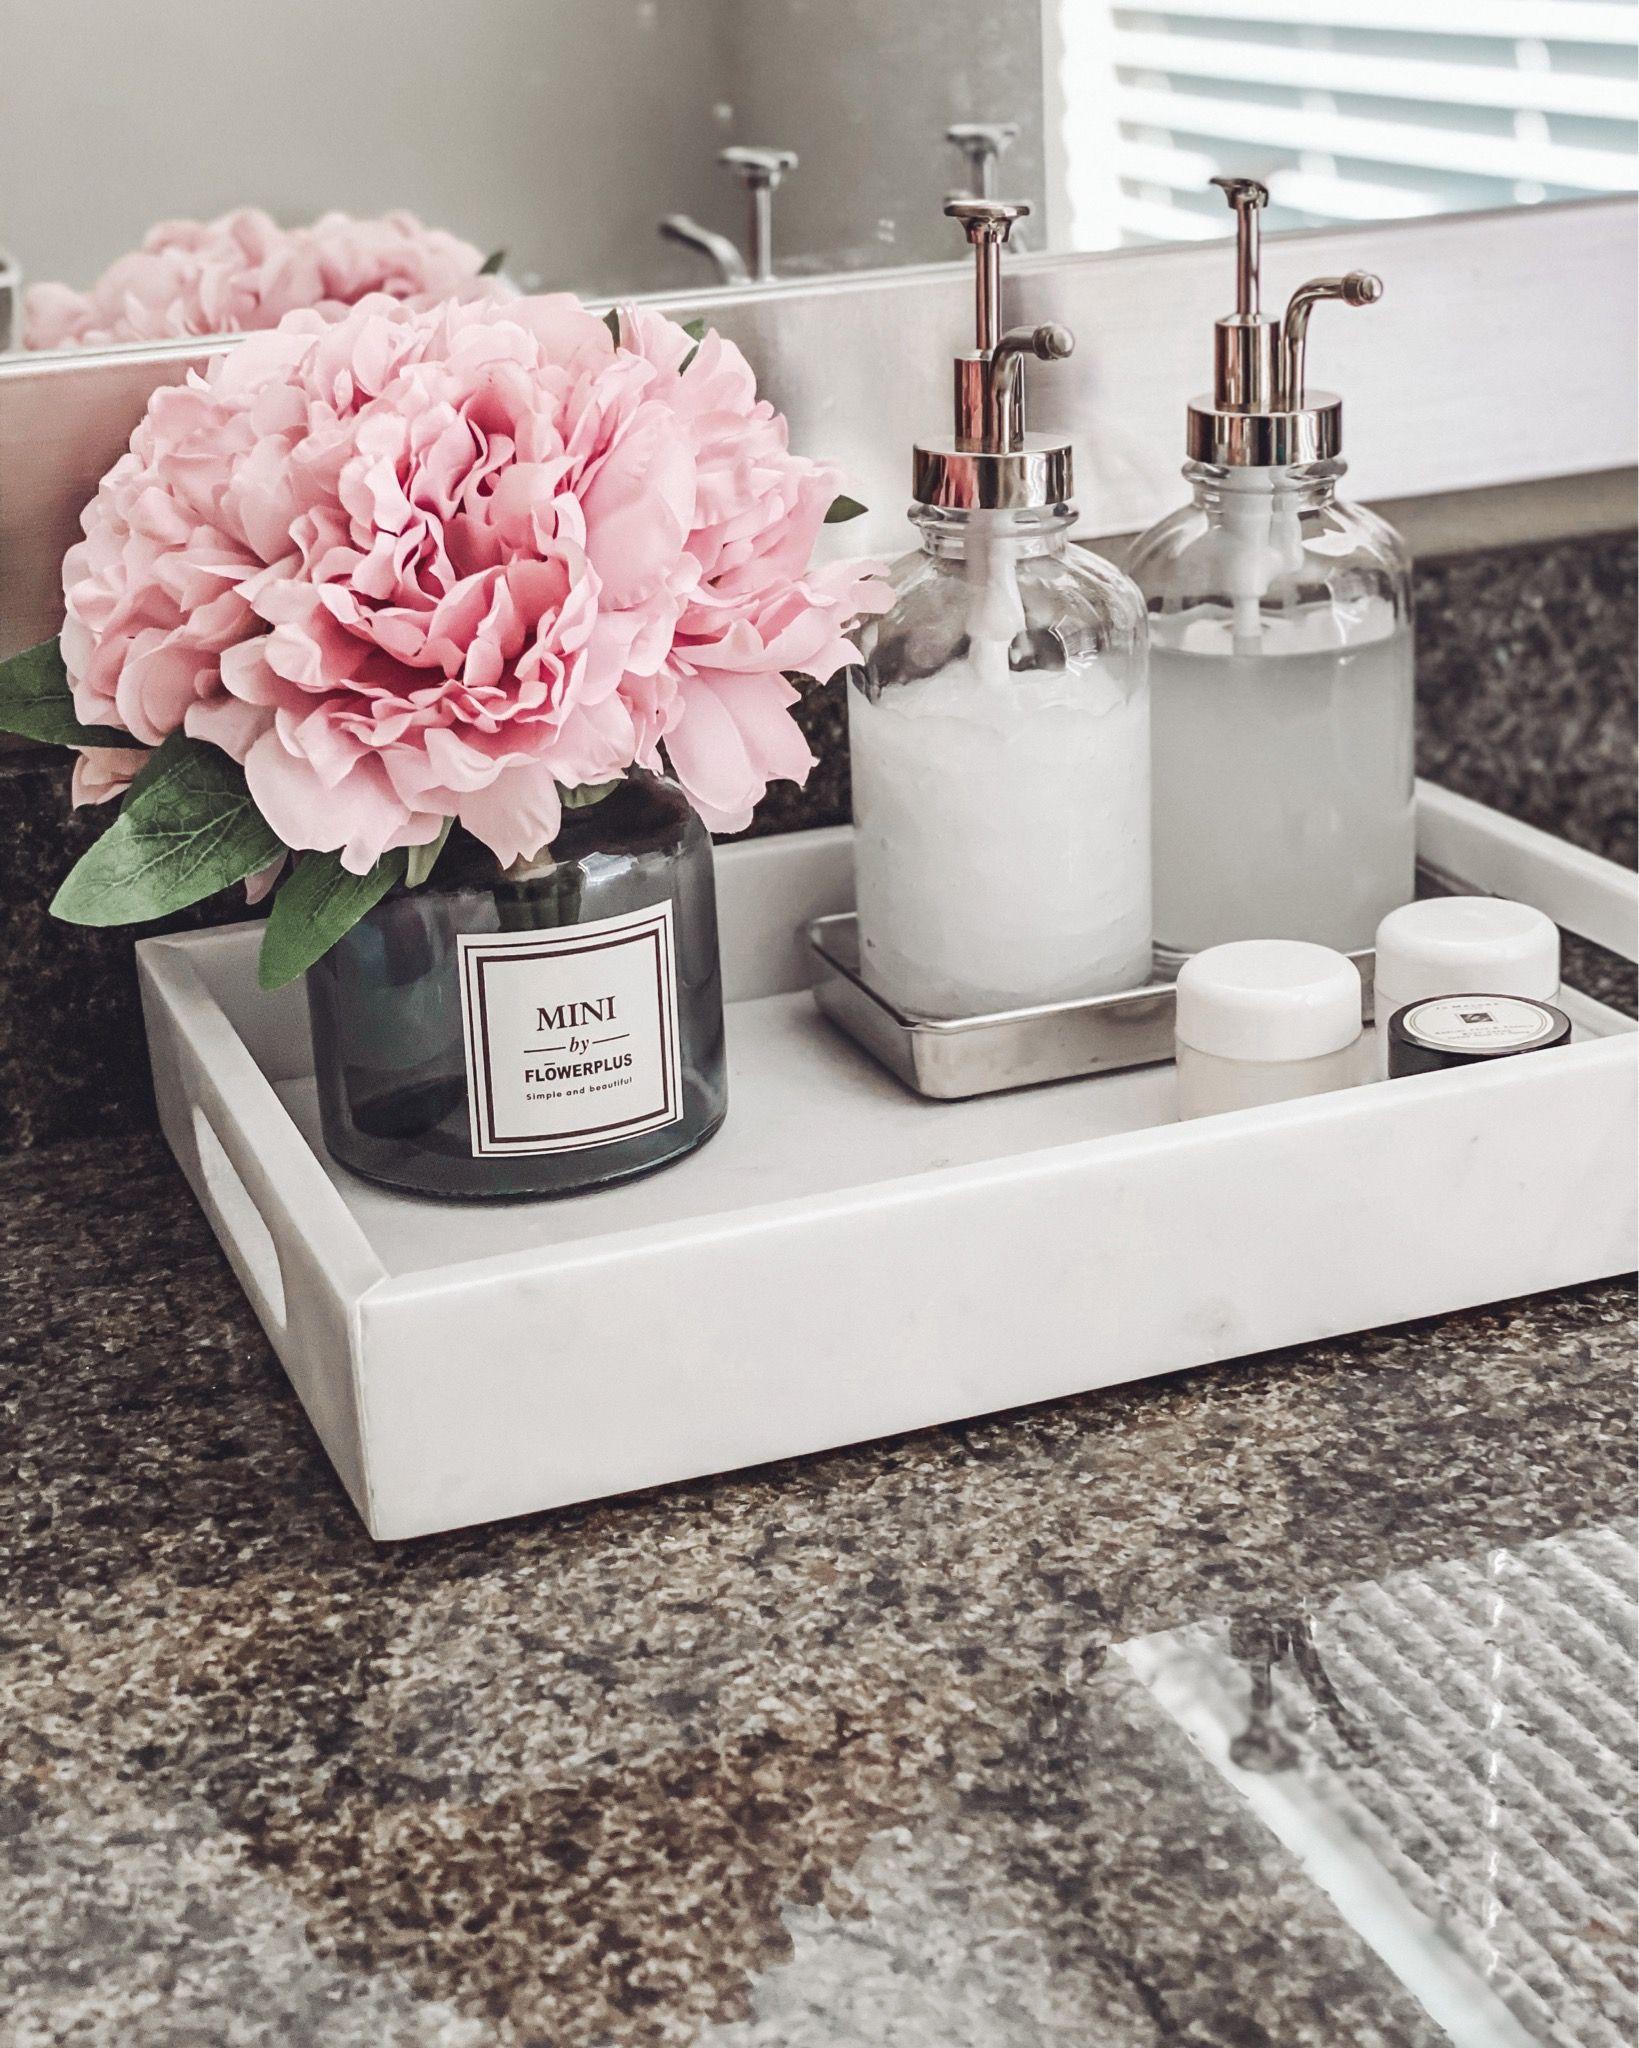 Stay organized with this pretty amazon & target home decor #bathroomdecor #bathroomorganization #bathroomorganizer #targethomedecor #targetfinds #amazonfinds #springdecor